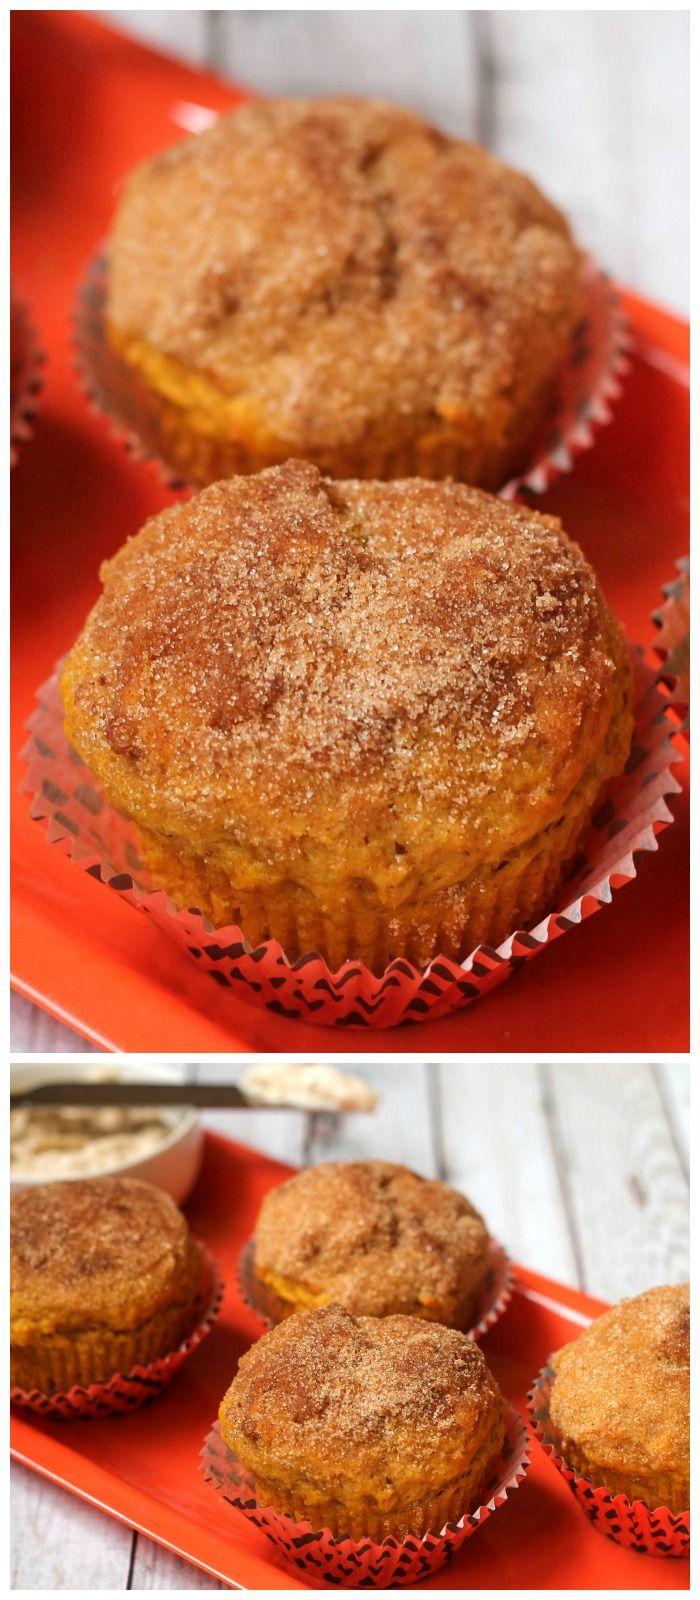 Easy and delicious Cinnamon Sugar Pumpkin Muffins - the perfect fall treat!